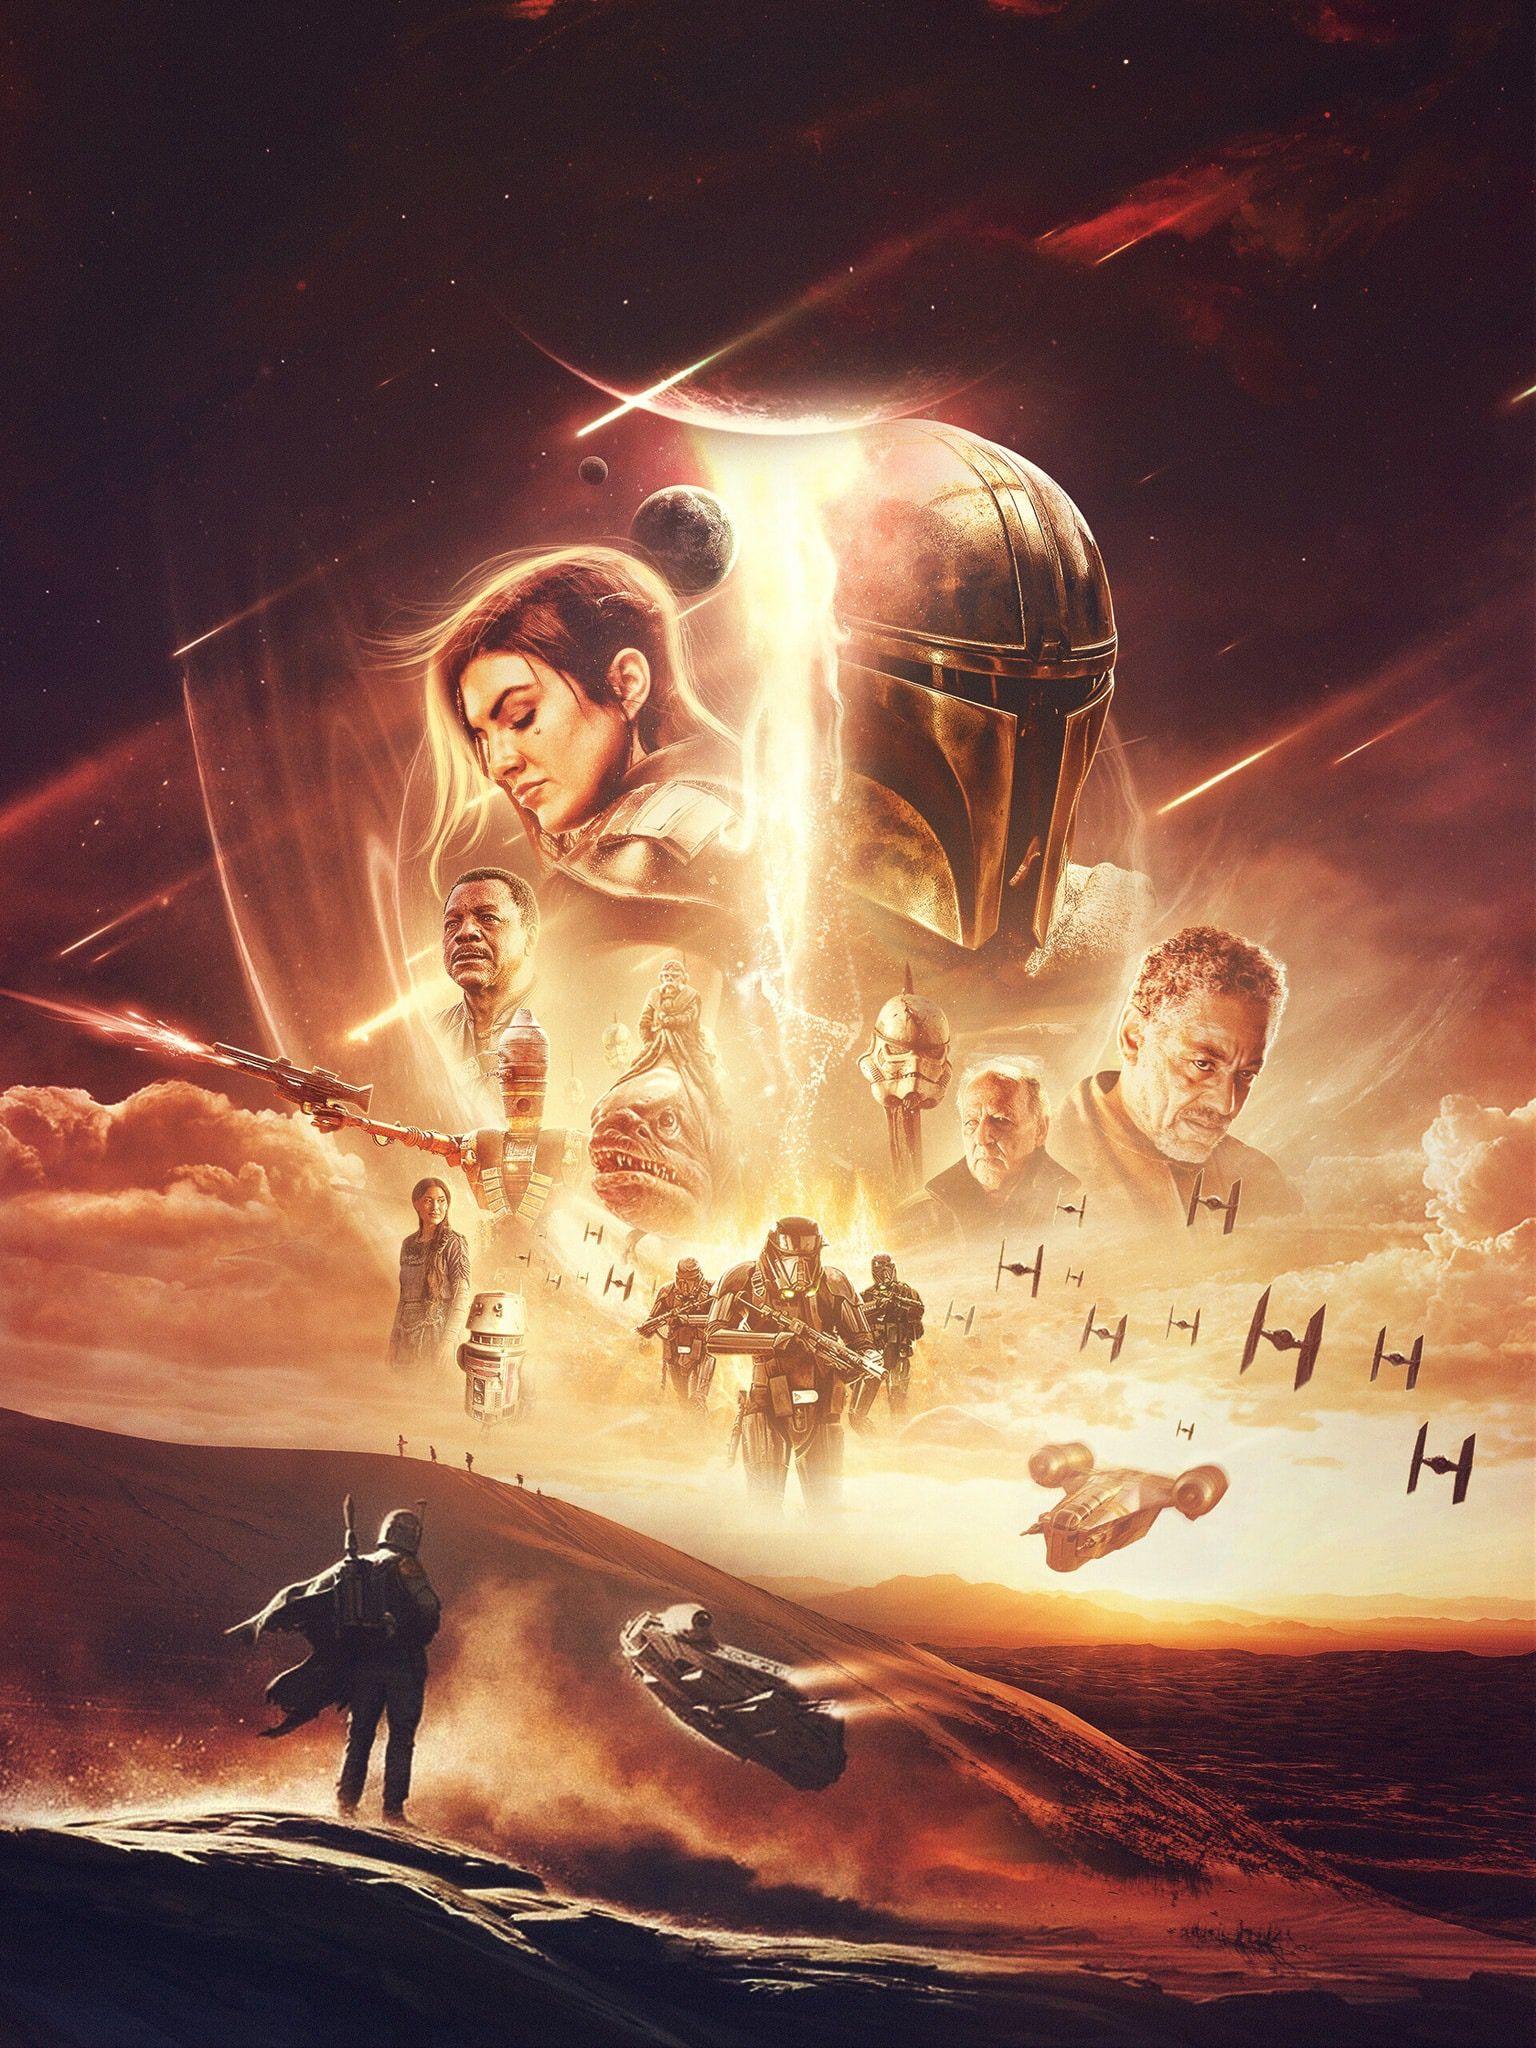 Themandalorian Starwarsart Disneyplus Mandalorian Poster Star Wars Art Star Wars Wallpaper